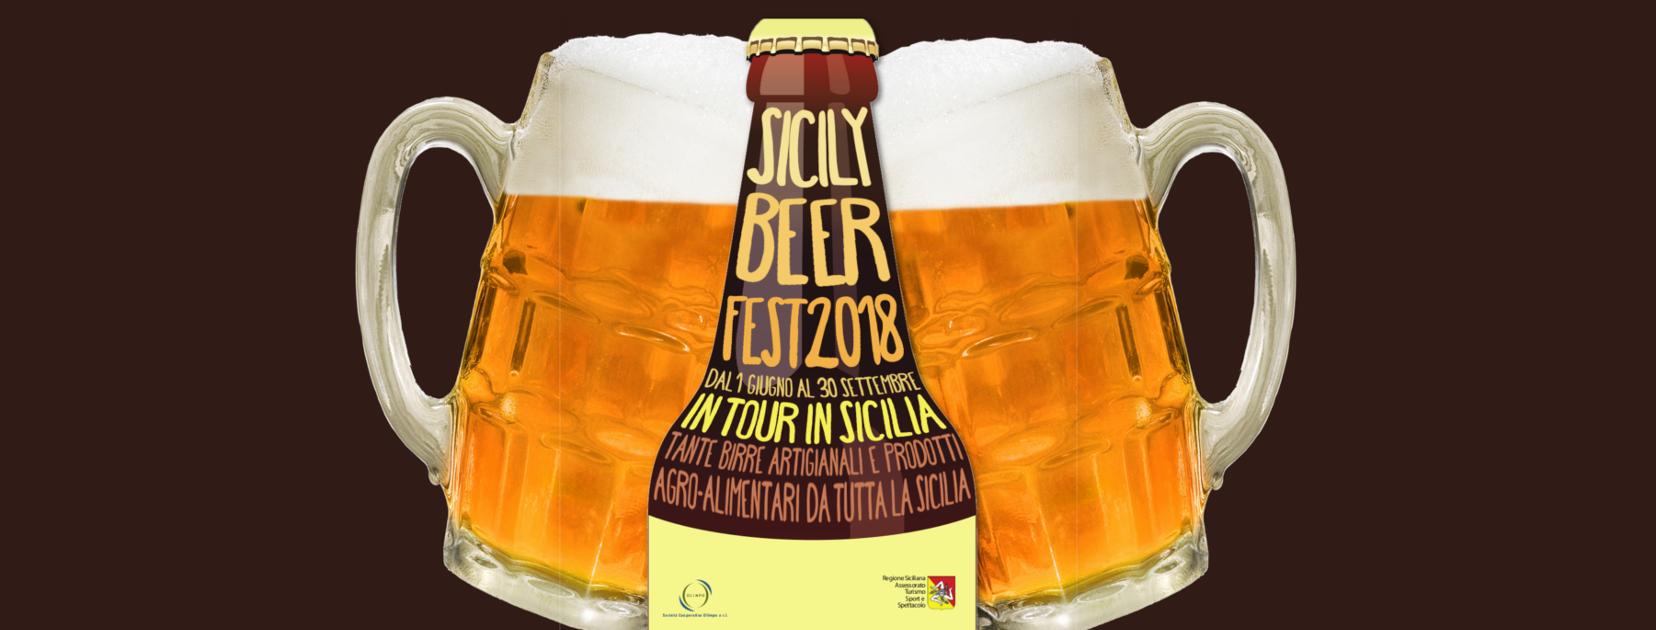 Sicily Beer Fest 2018